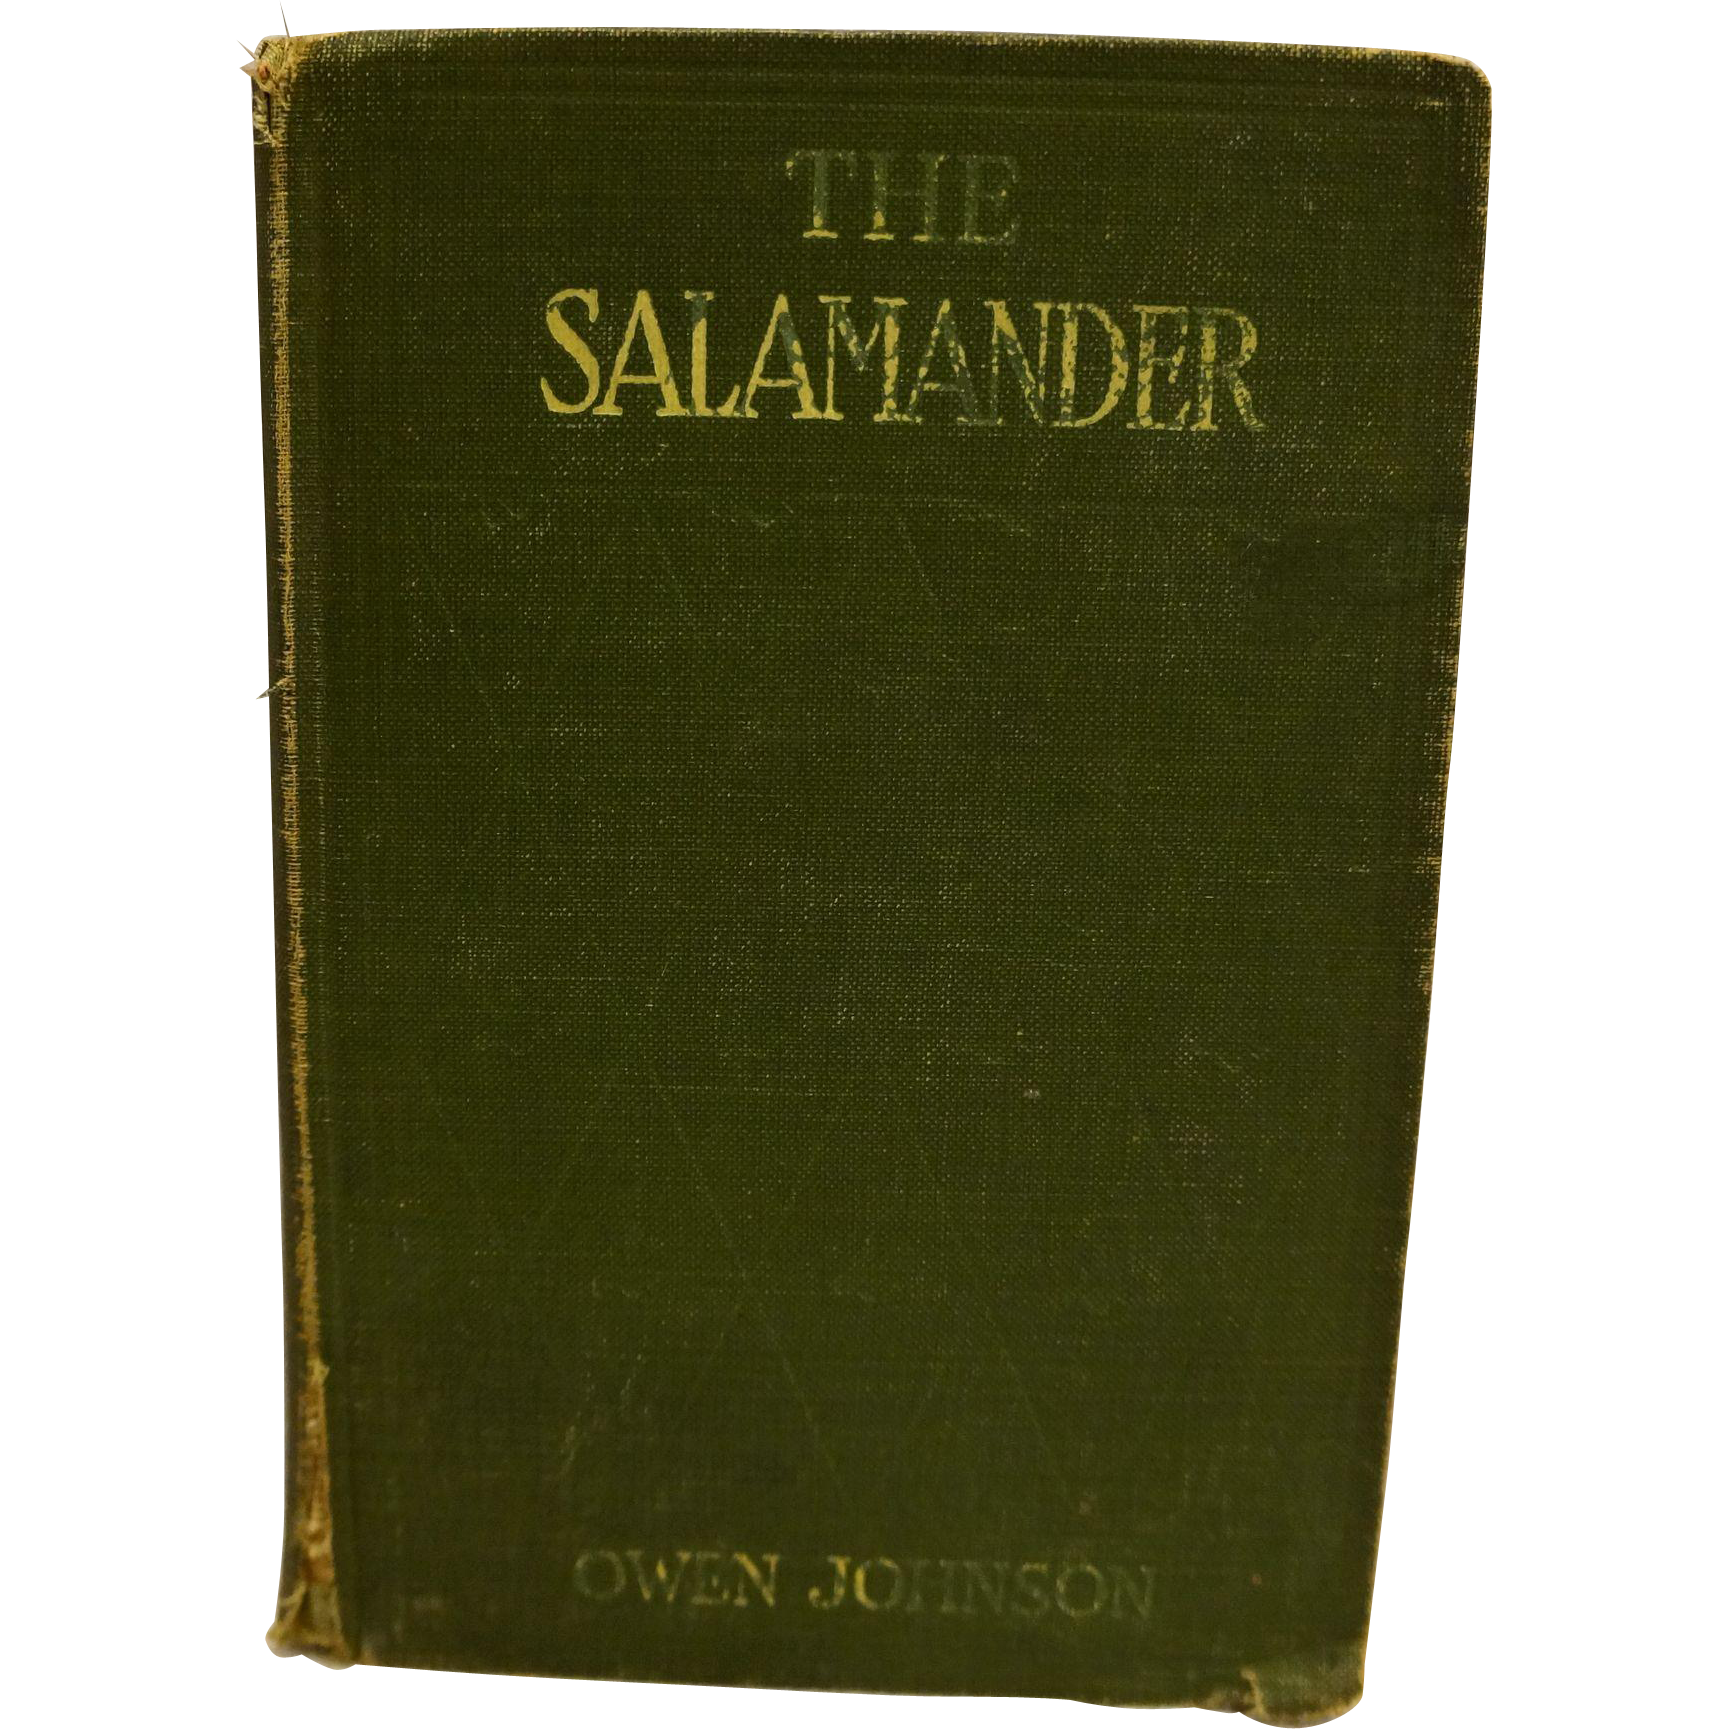 The Salamander by Owen Johnson Green Hardcover 1914